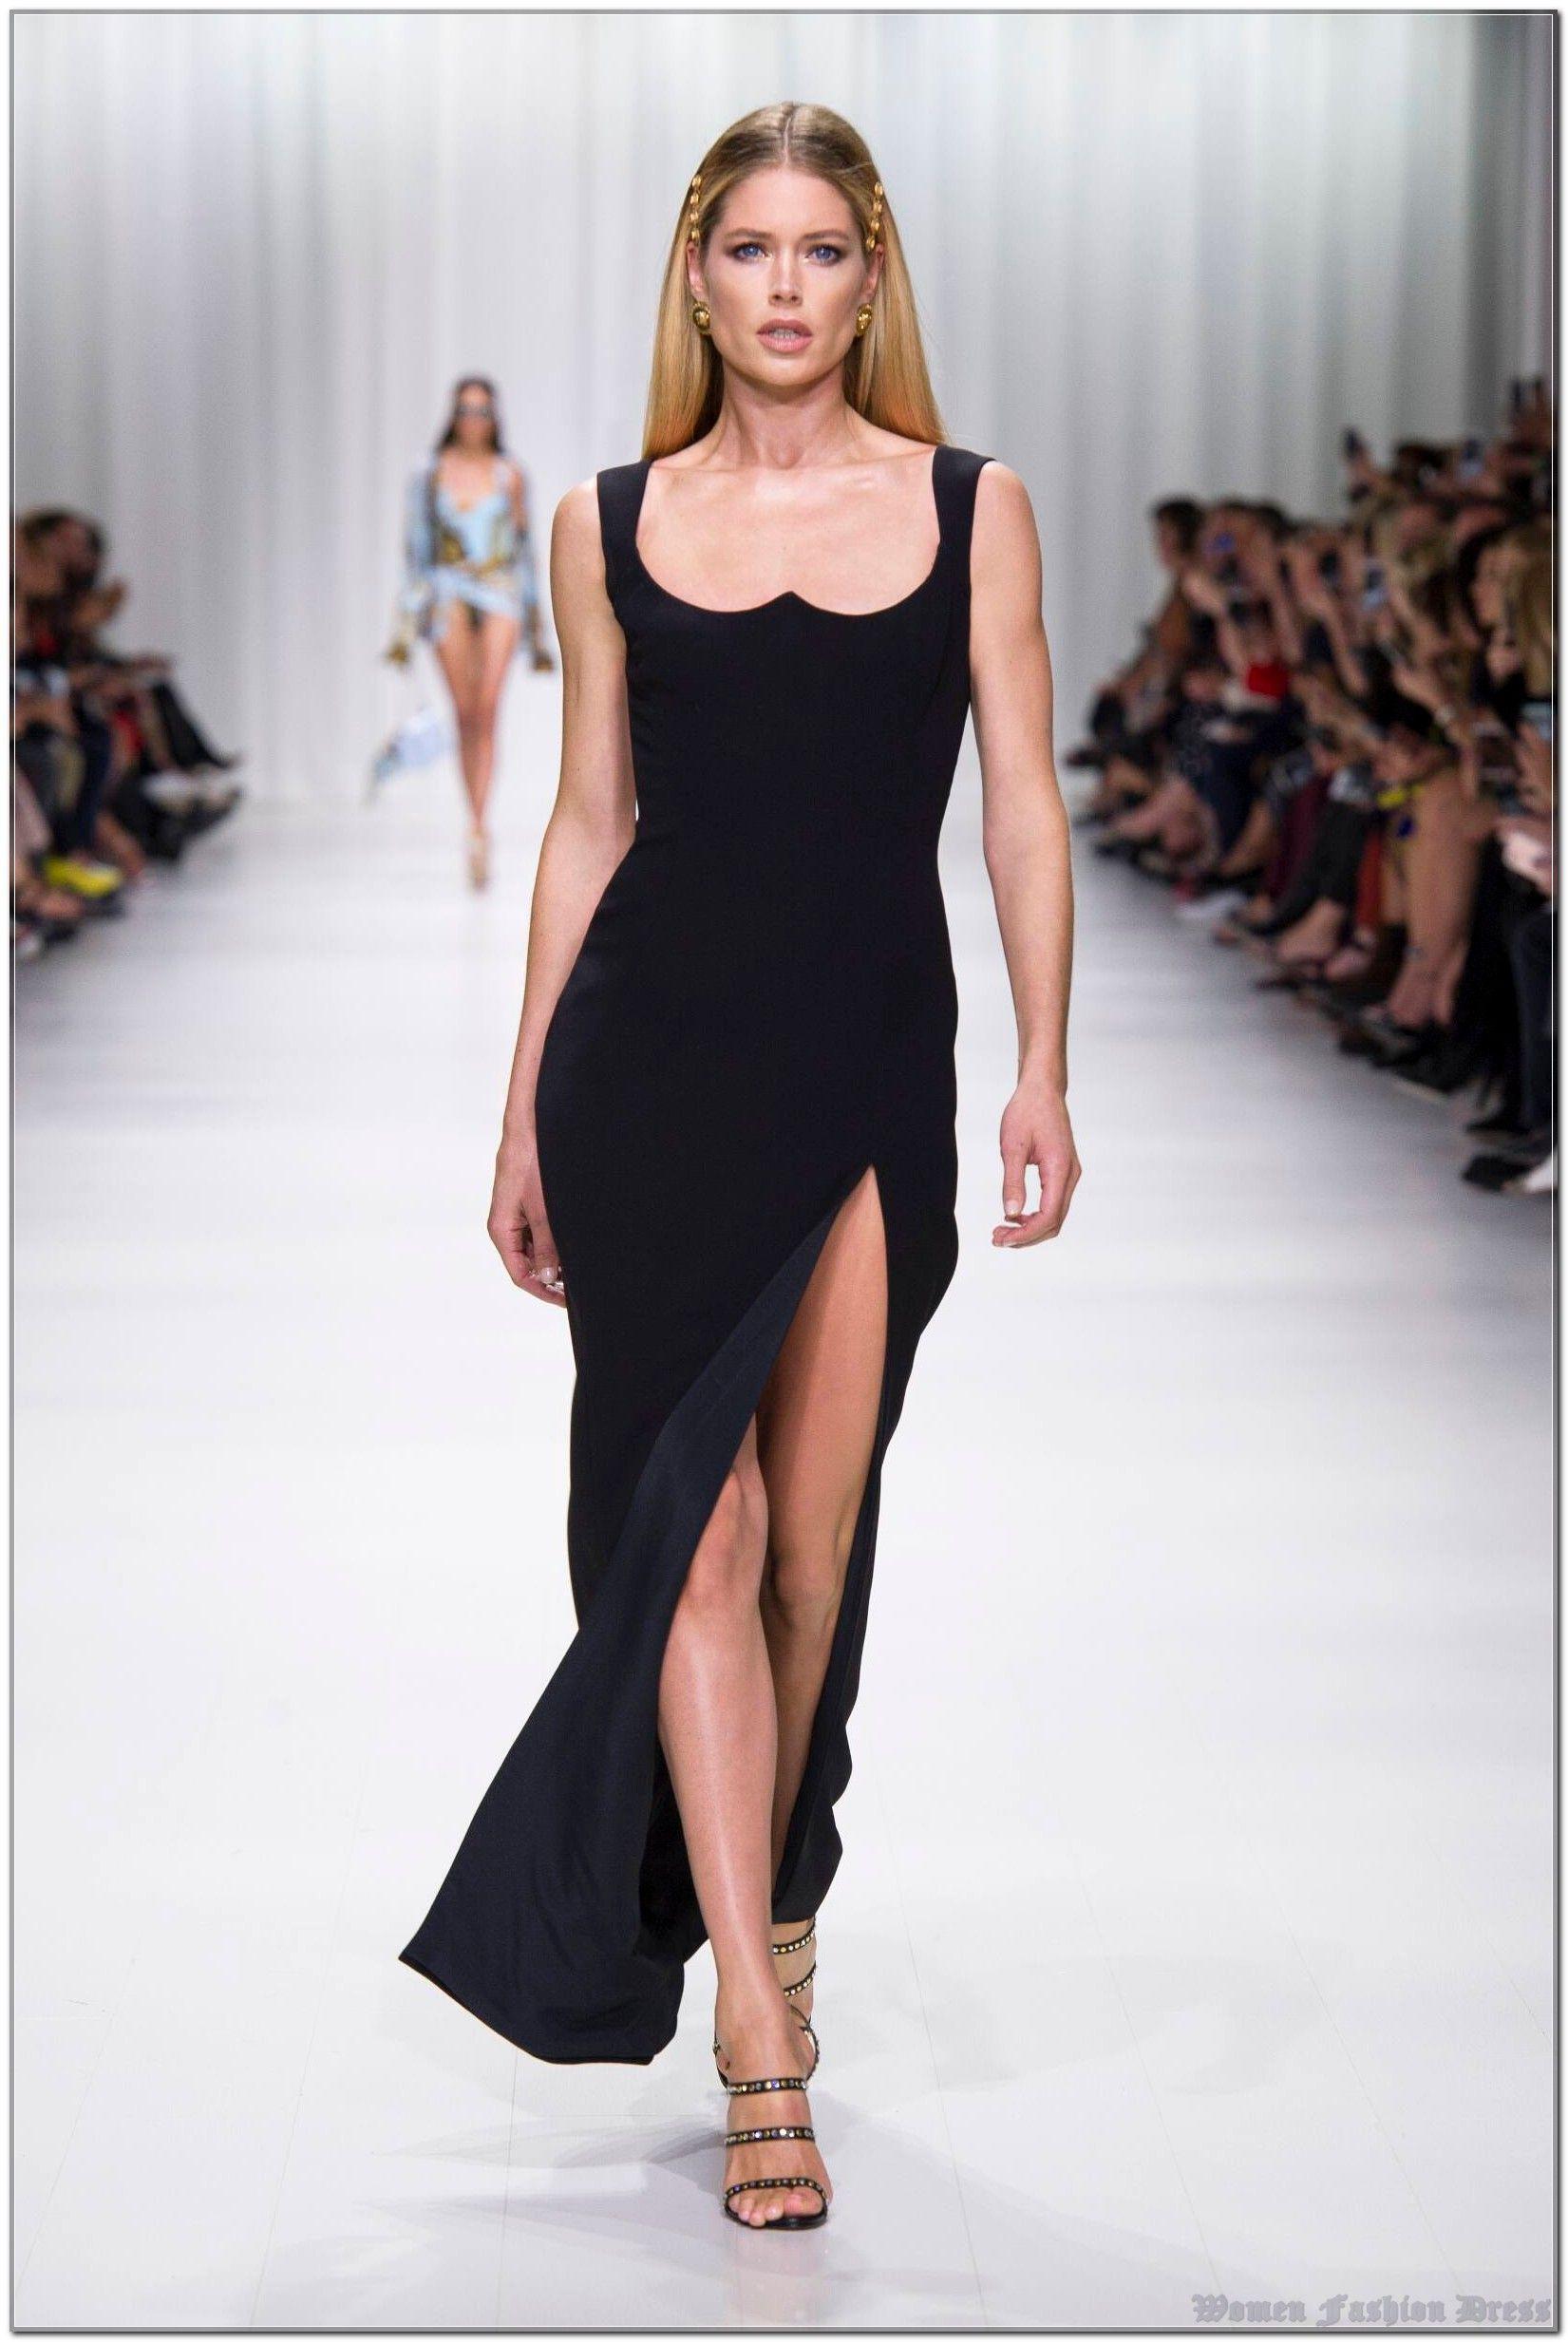 7 Days To Improving The Way You Women Fashion Dress